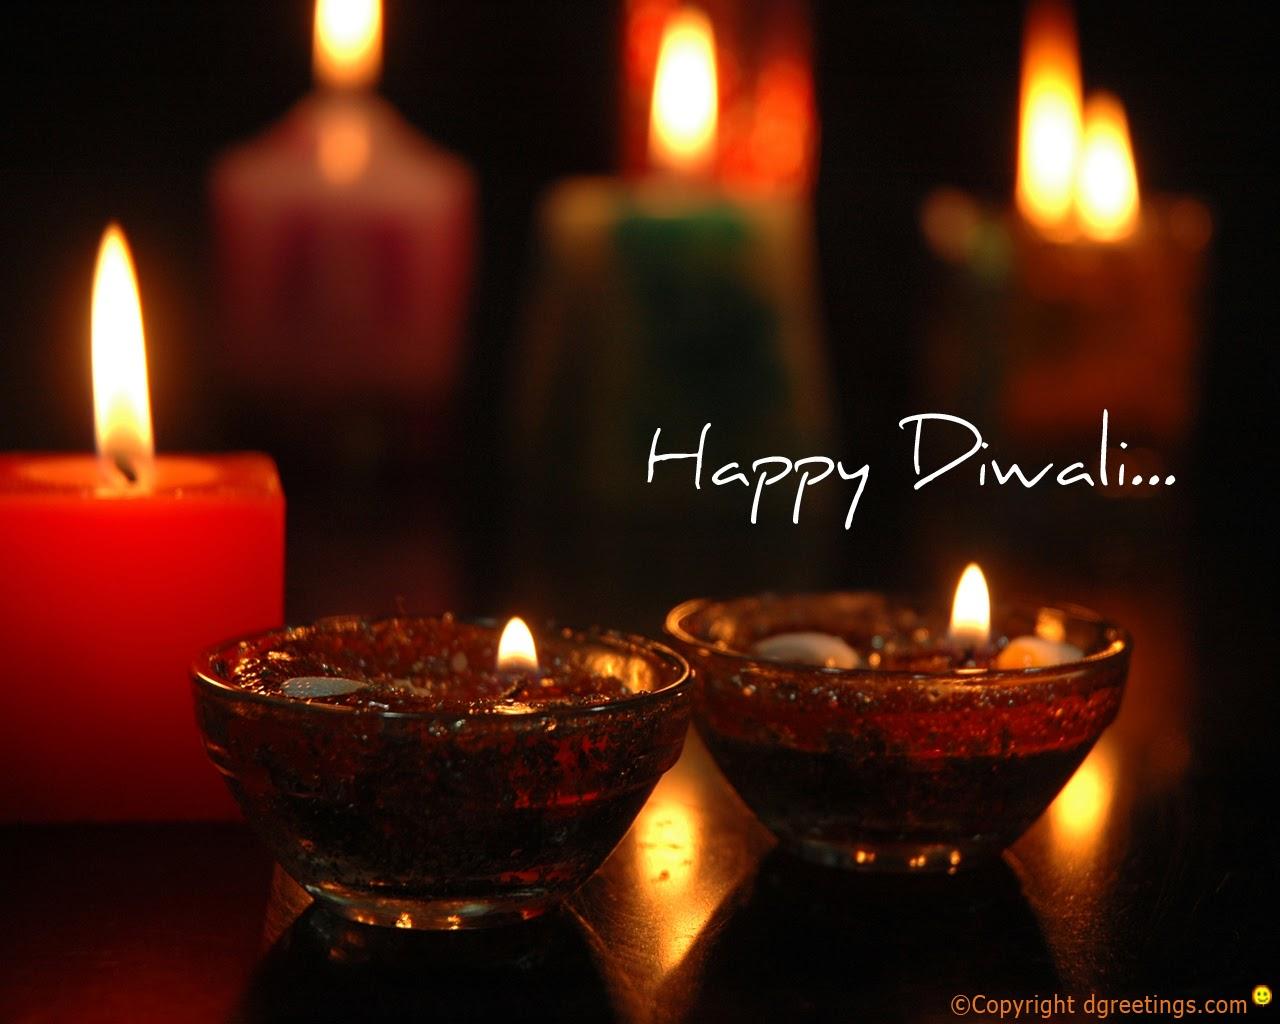 1280x1024px Hd Wallpapers Happy Diwali Wallpapersafari